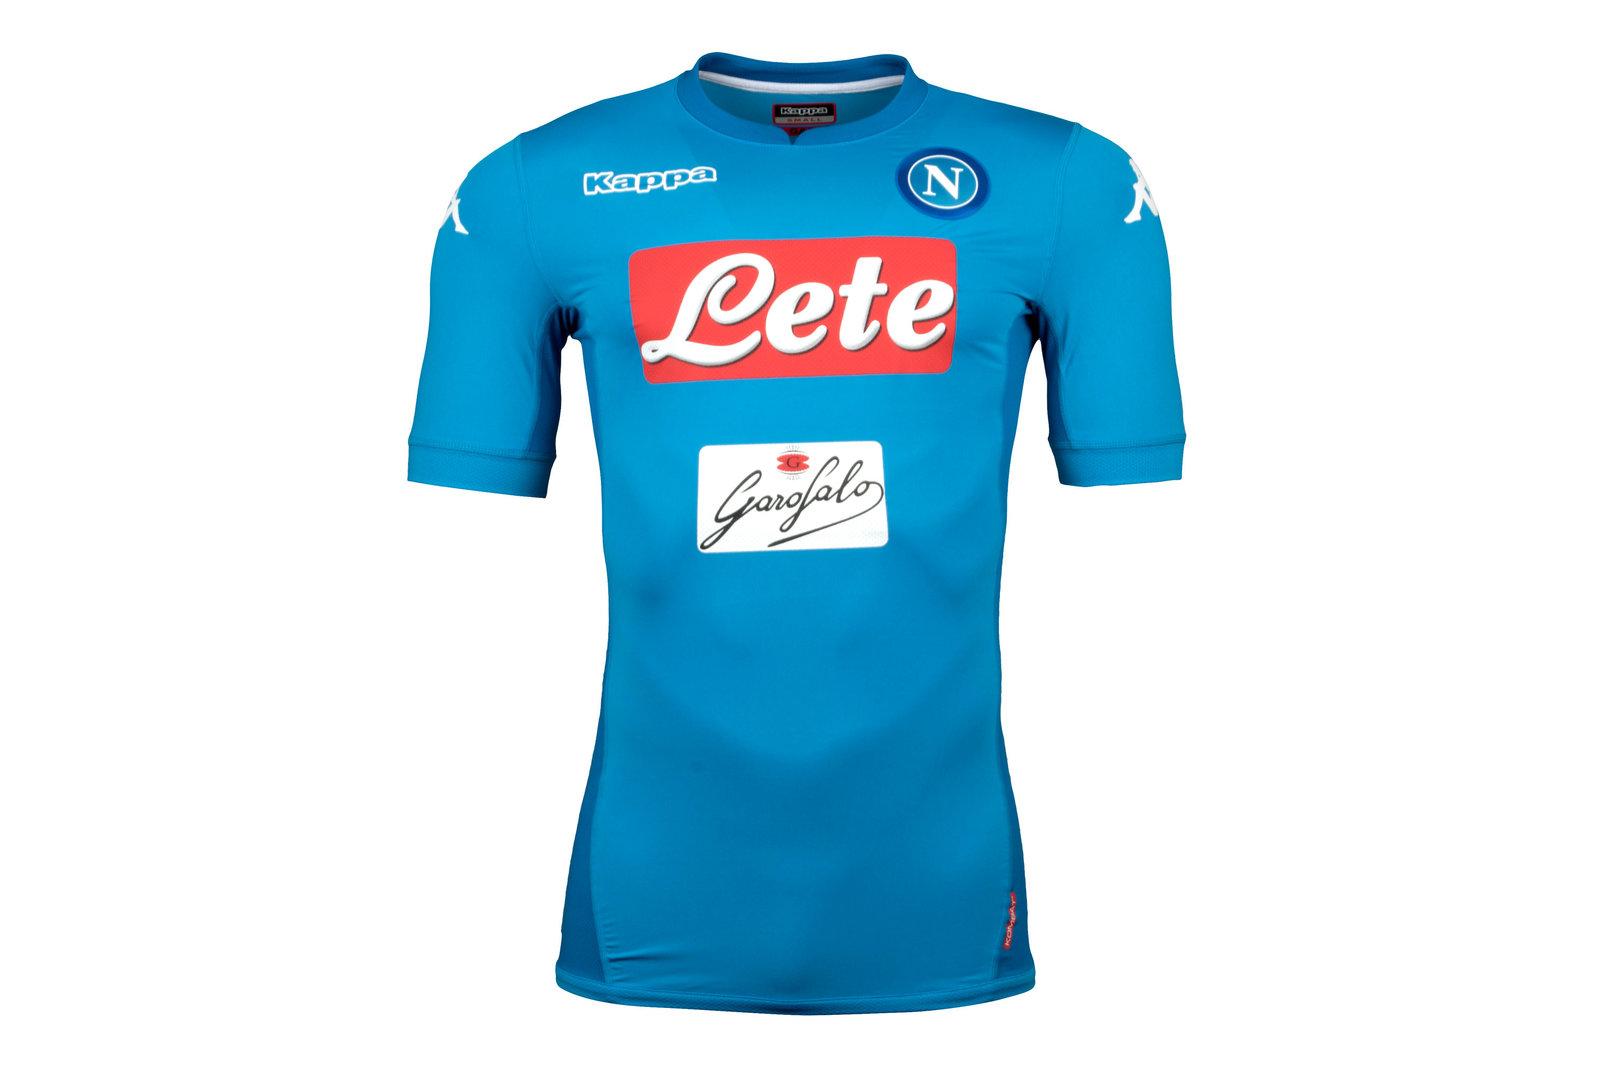 Napoli 17/18 Home short sleeve Players Match Football Shirt